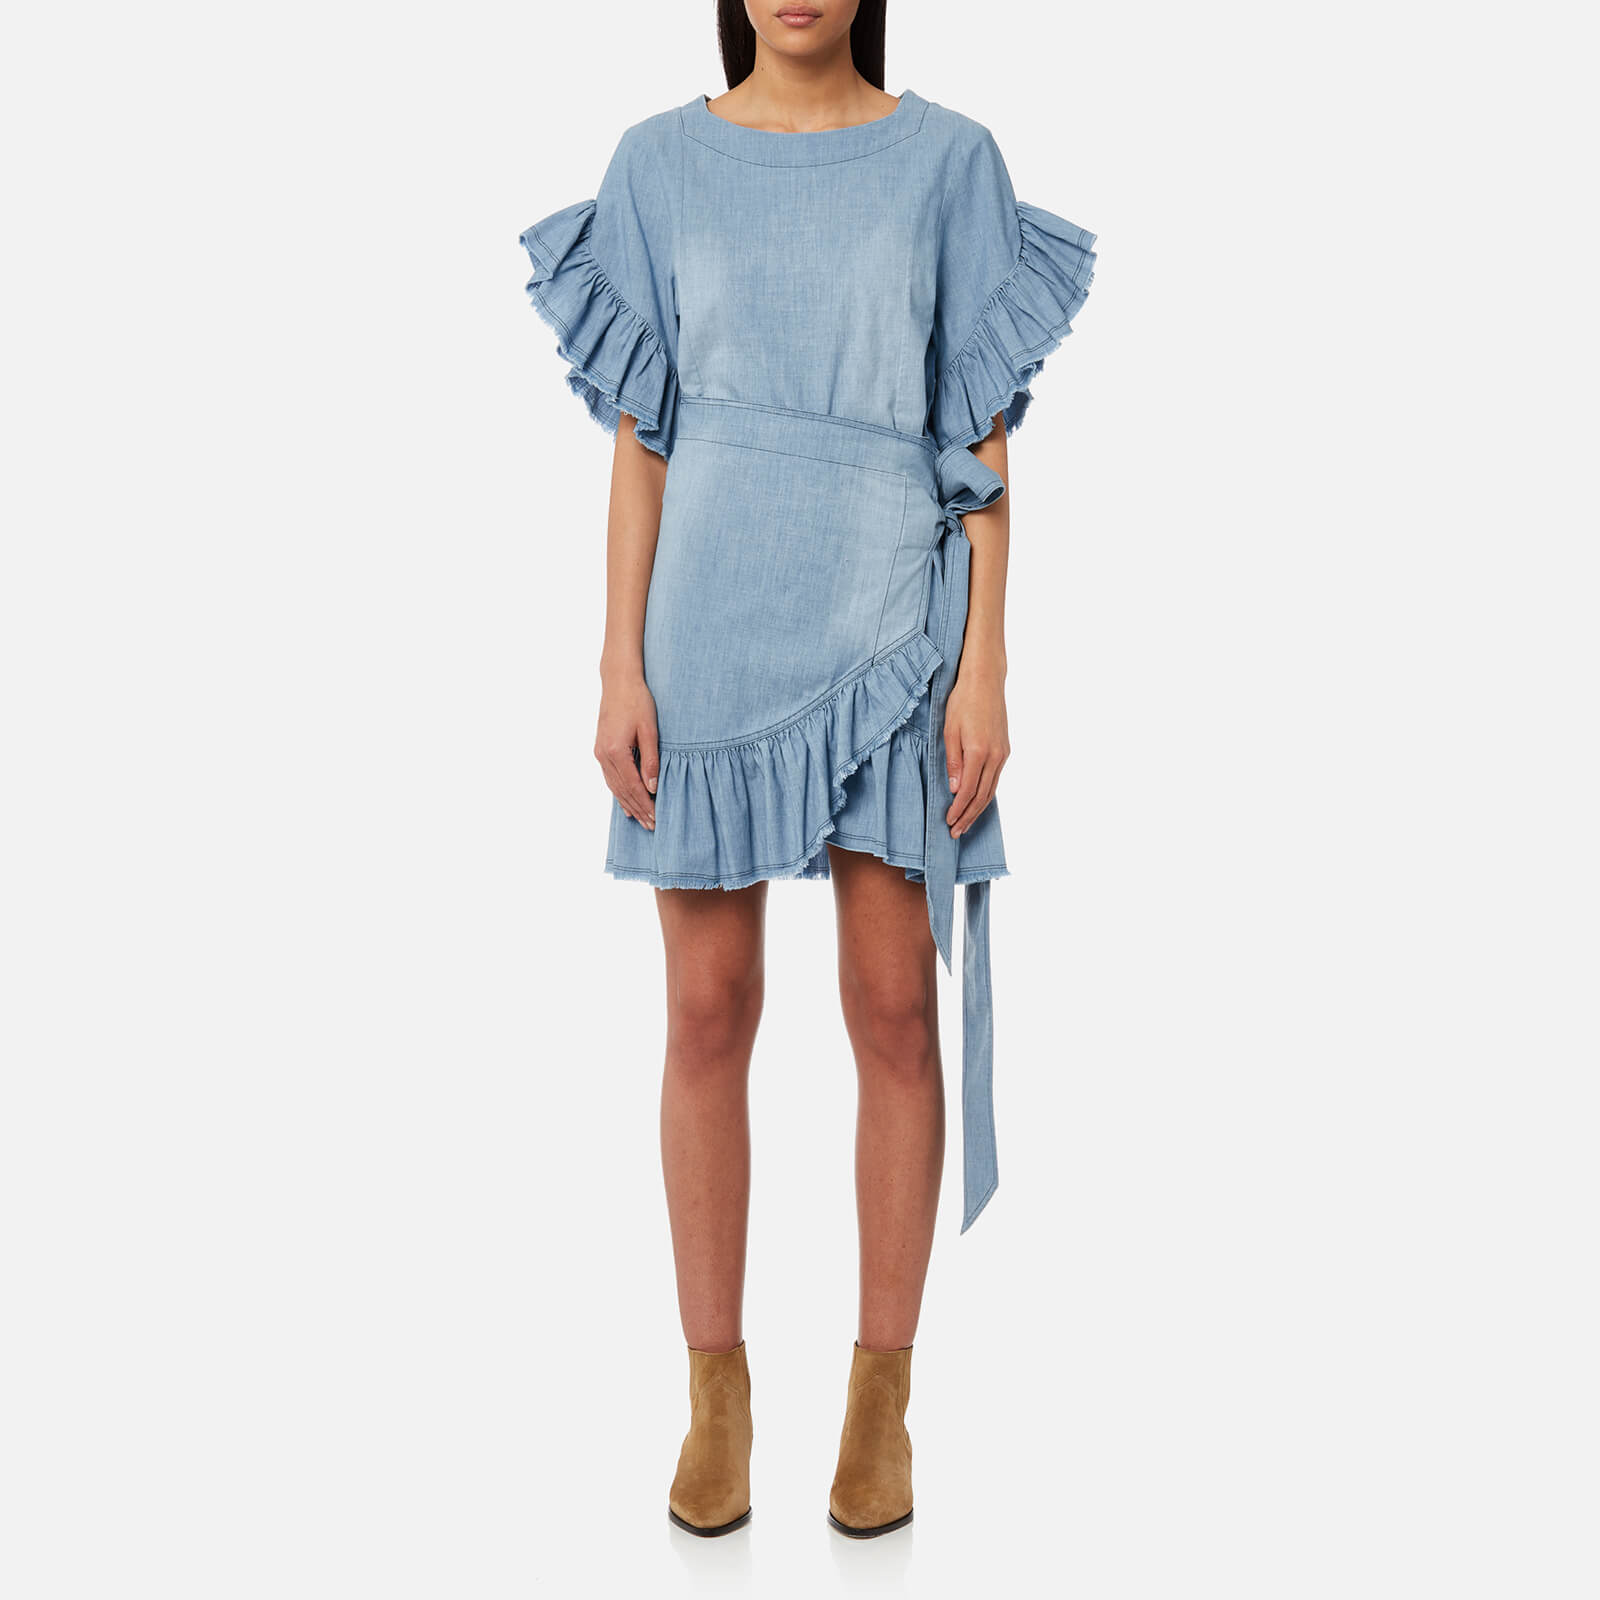 0ffa930e2f6 Isabel Marant Etoile Women s Lelicia Dress - Blue - Free UK Delivery over  £50